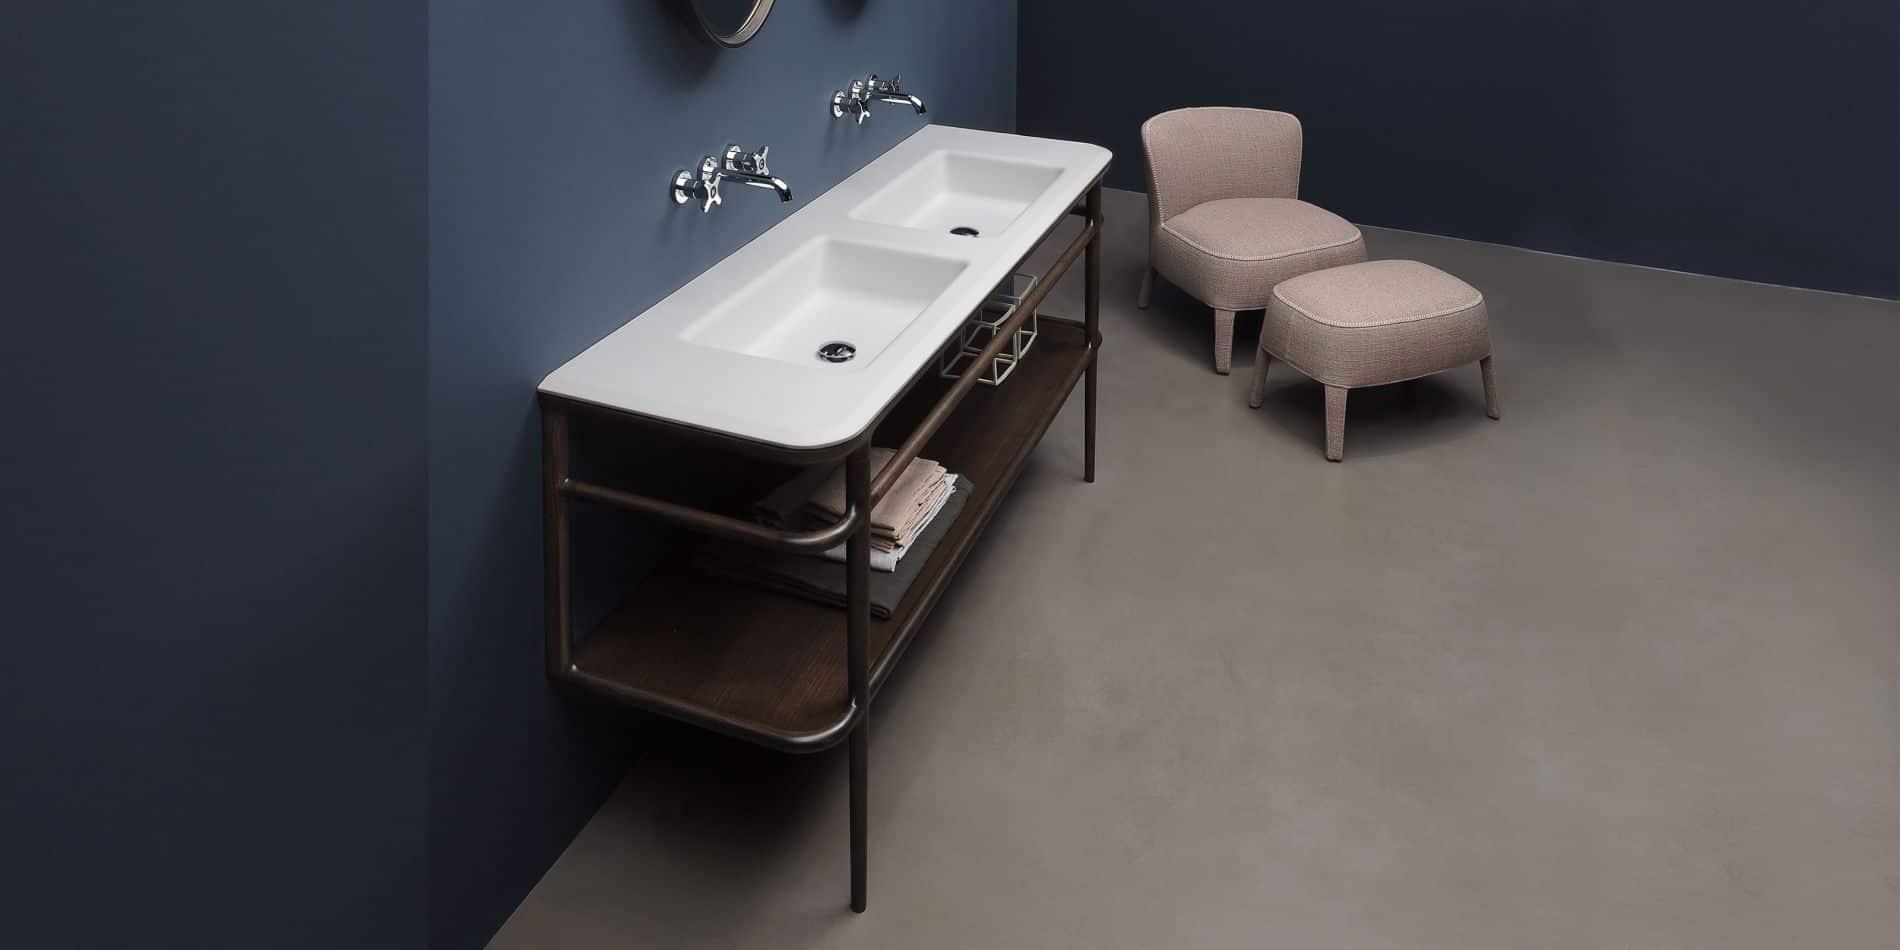 Bathroom Furniture Colection Ilbagno from Antonio Lupi